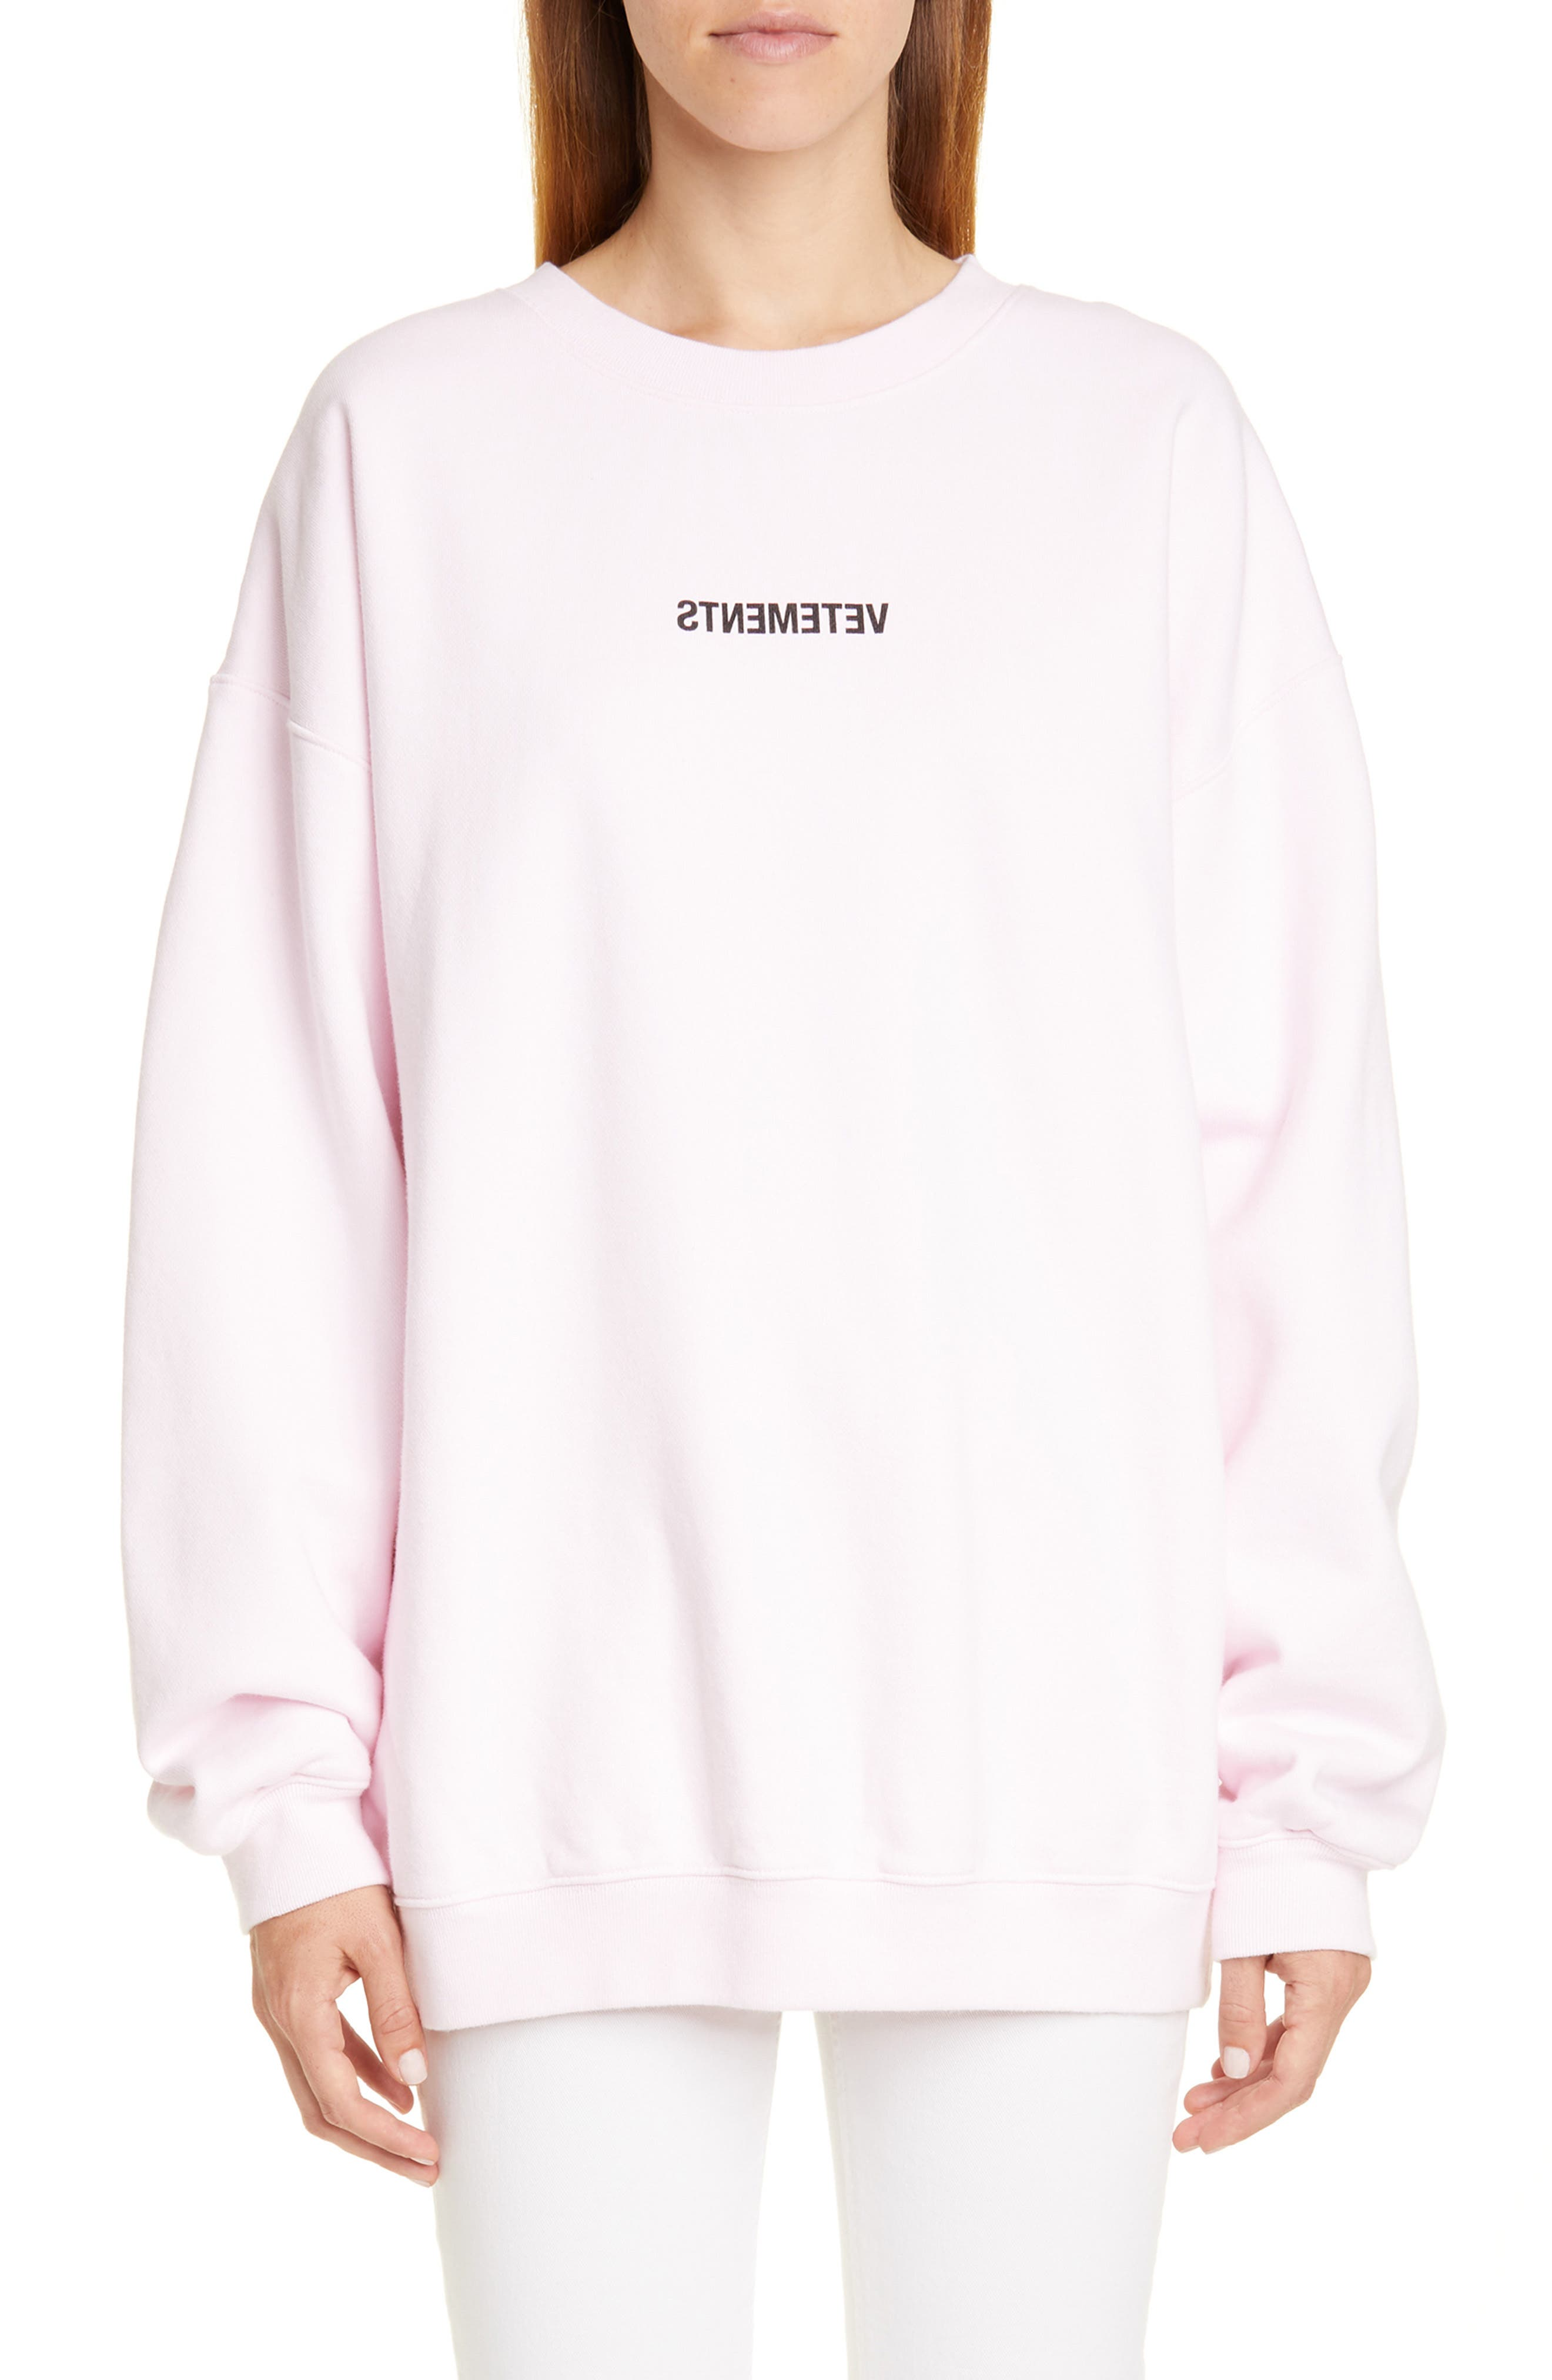 Vetements Shirts Inverted Logo Sweatshirt